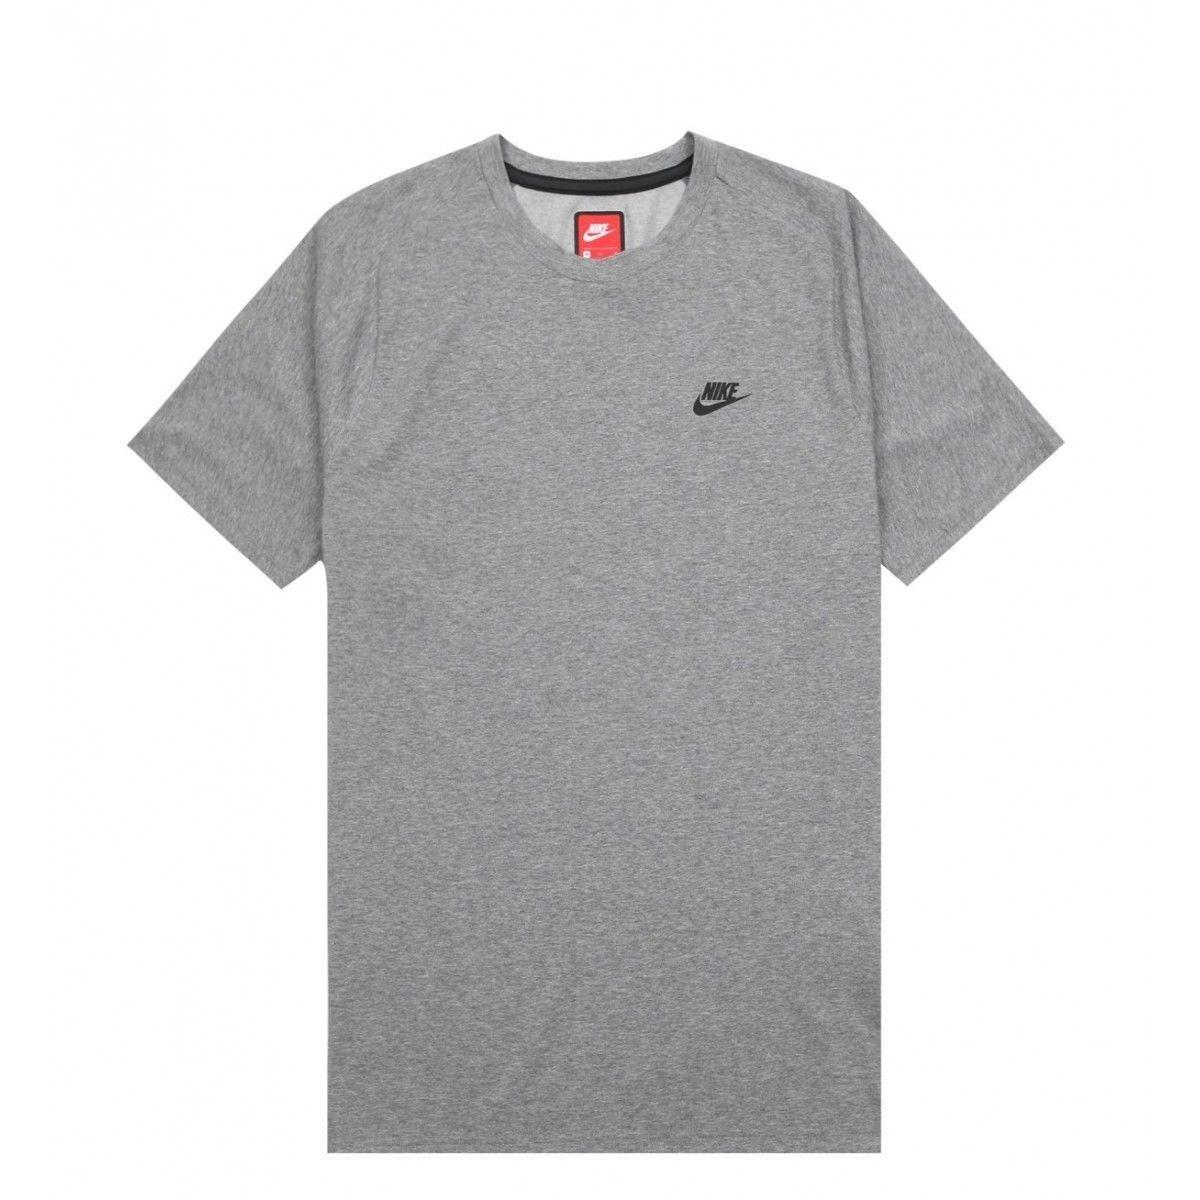 Tee shirt Bonded Men 861520 091 Taille : S;L;XL | T